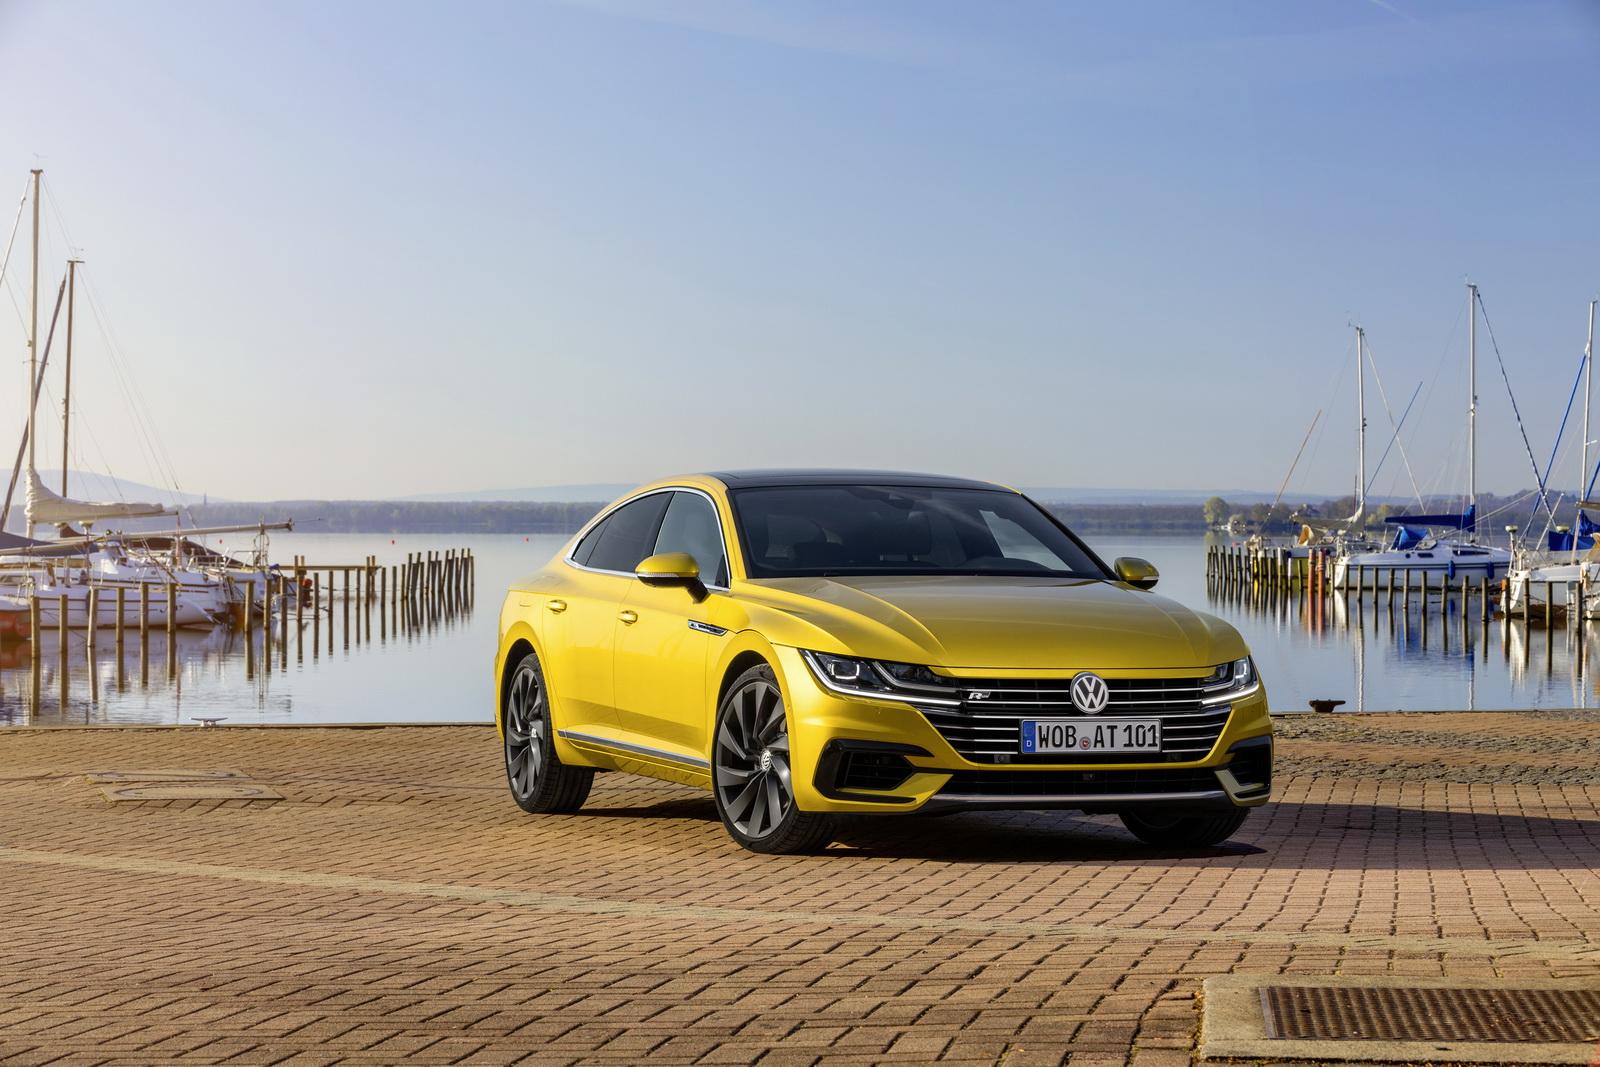 2018 Volkswagen Artheon Launched With Big Photo Gallery